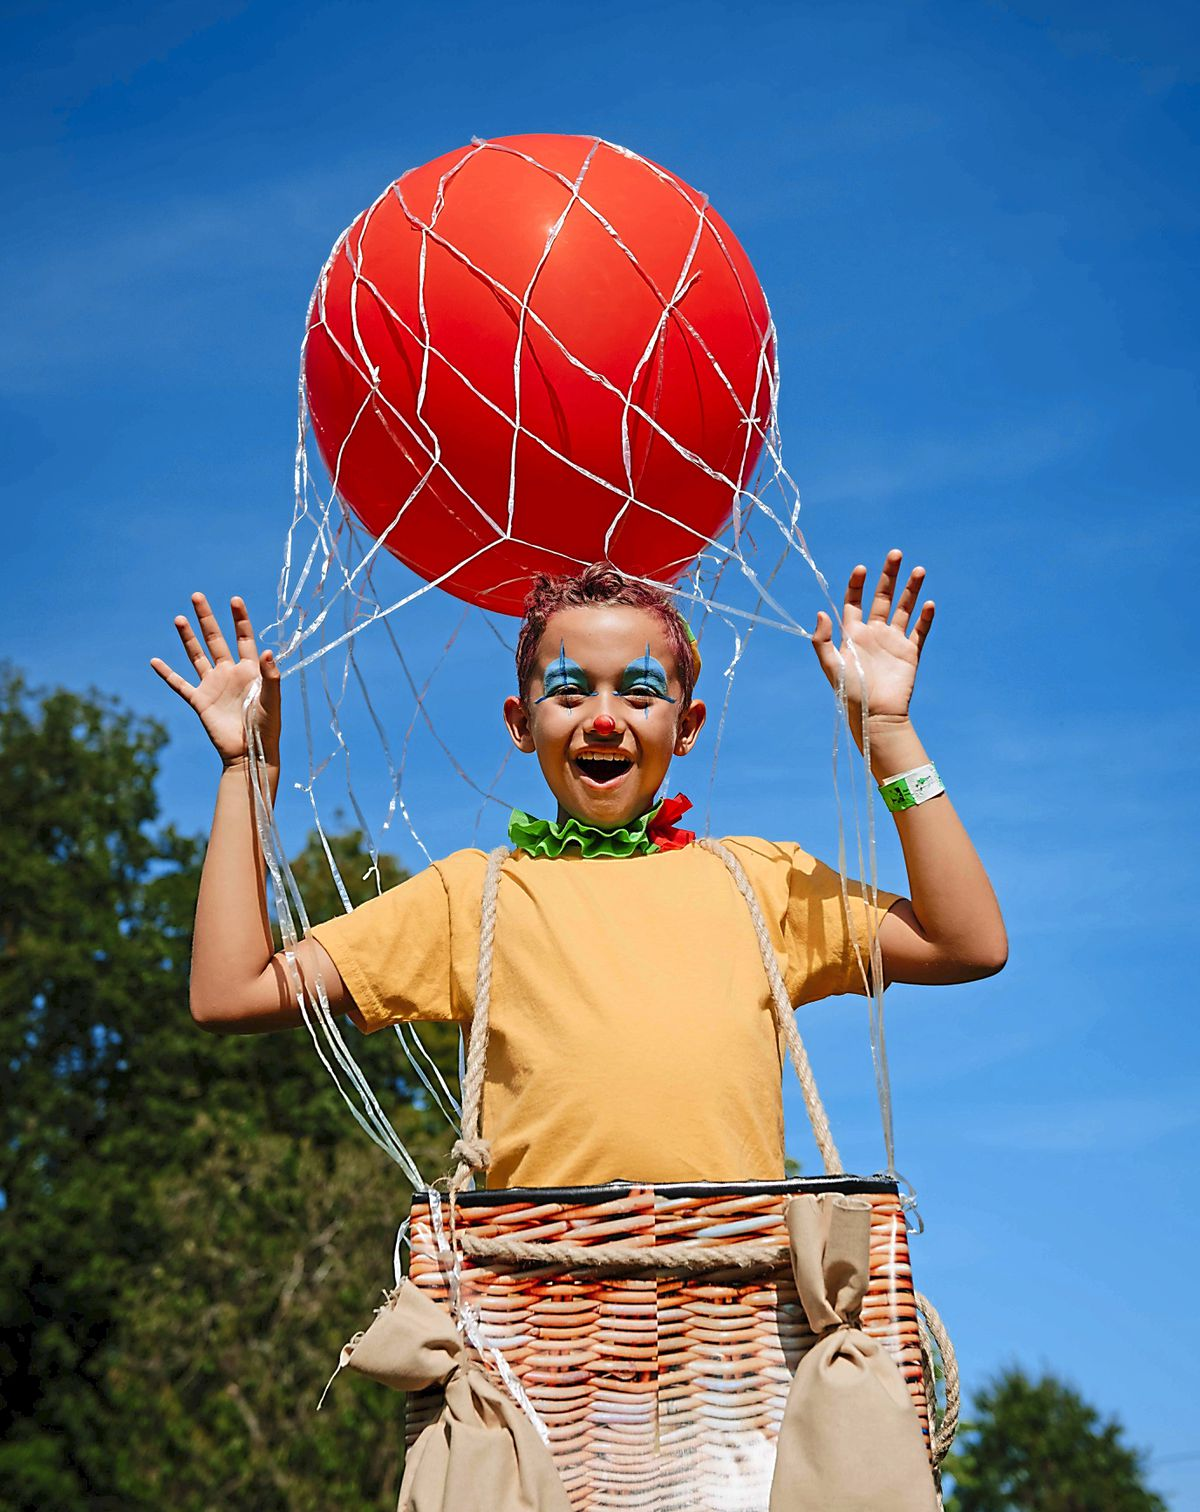 Fun at Oswestry Balloon Carnival